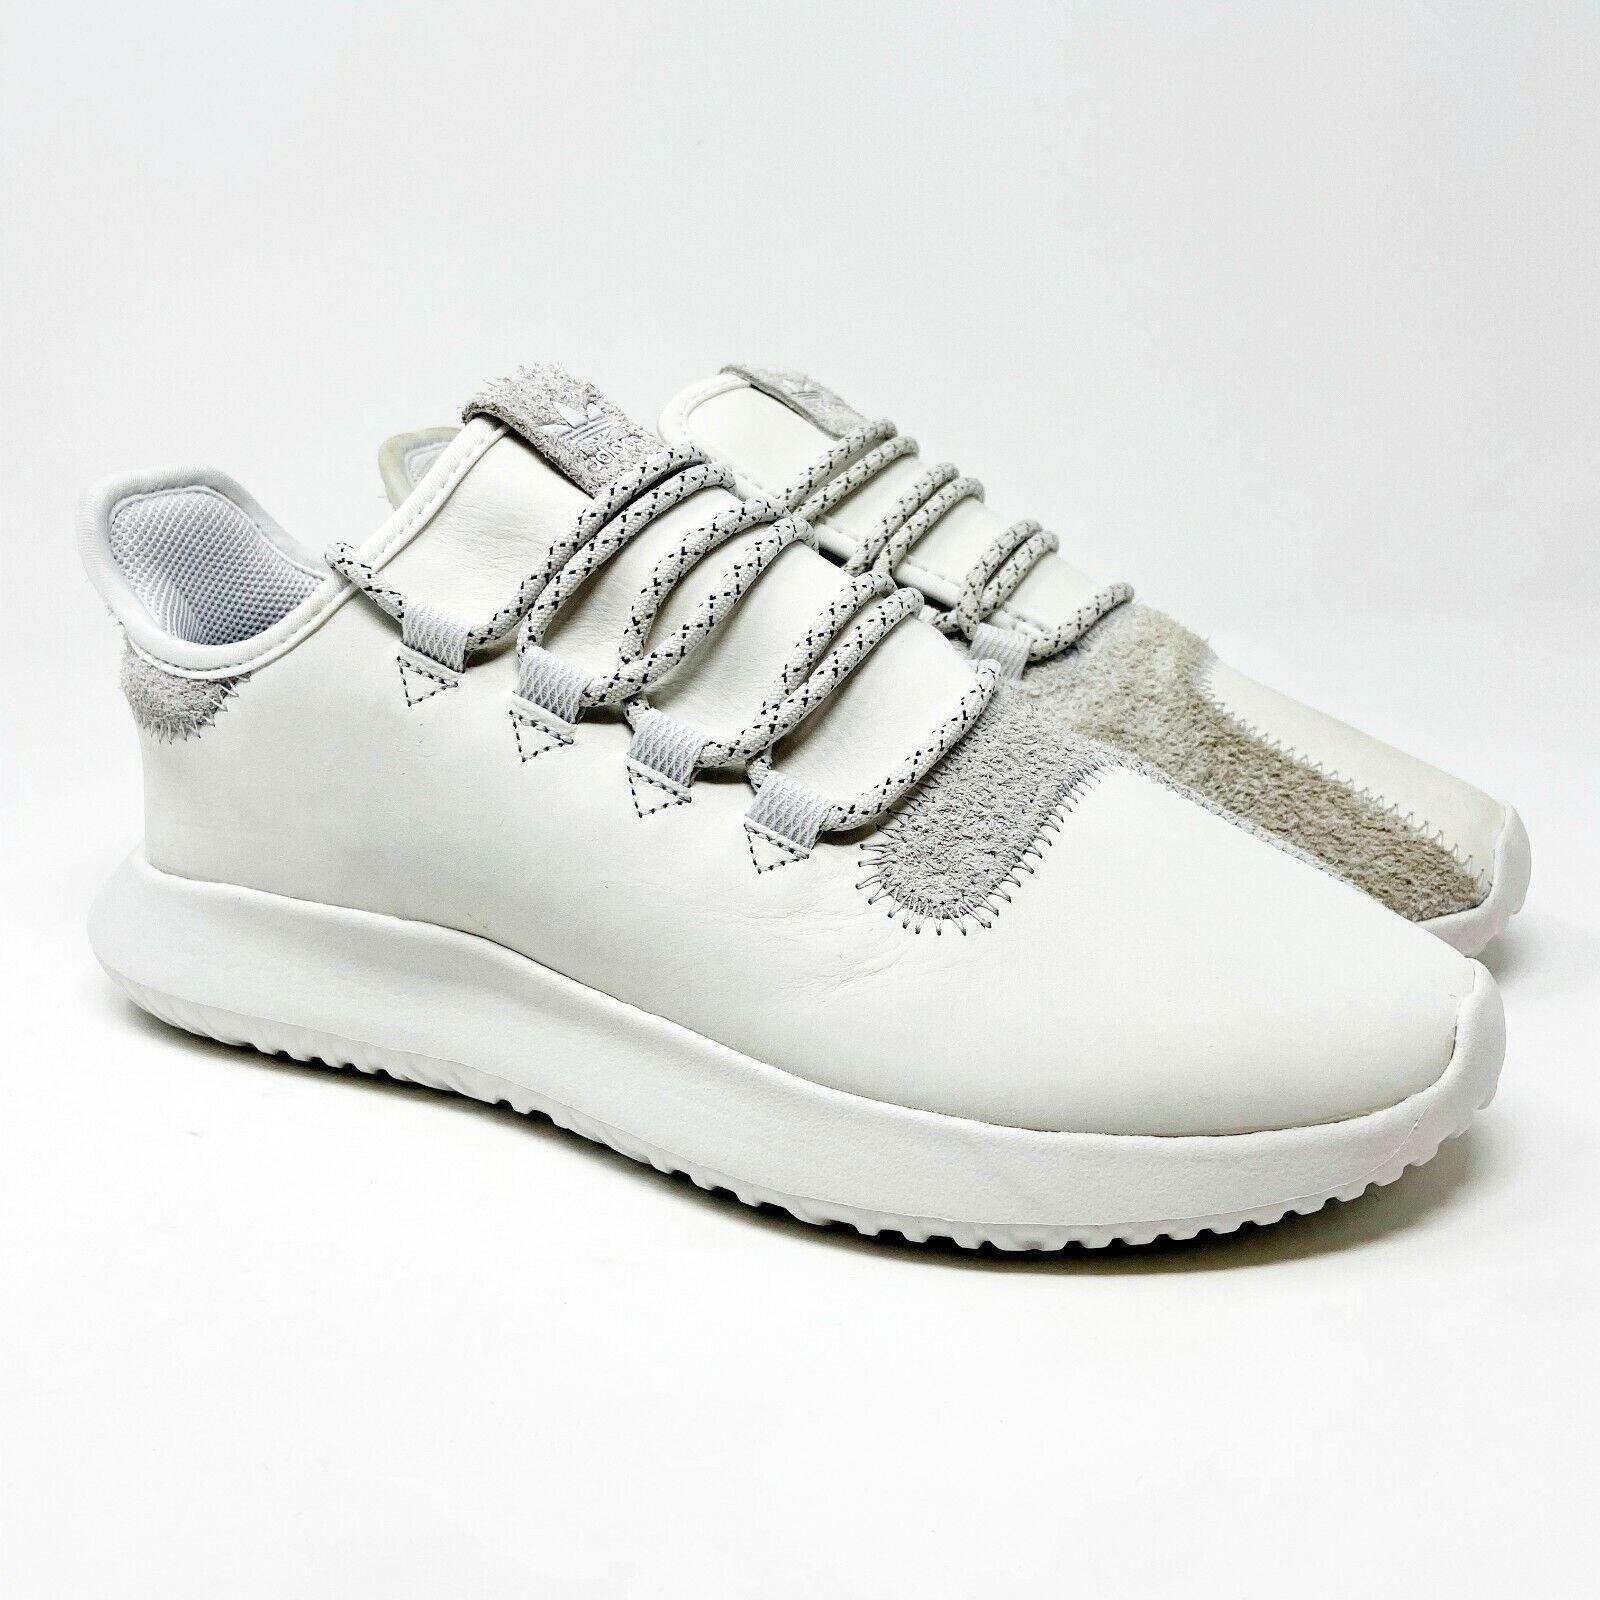 adidas Tubular Shadow купить на eBay в